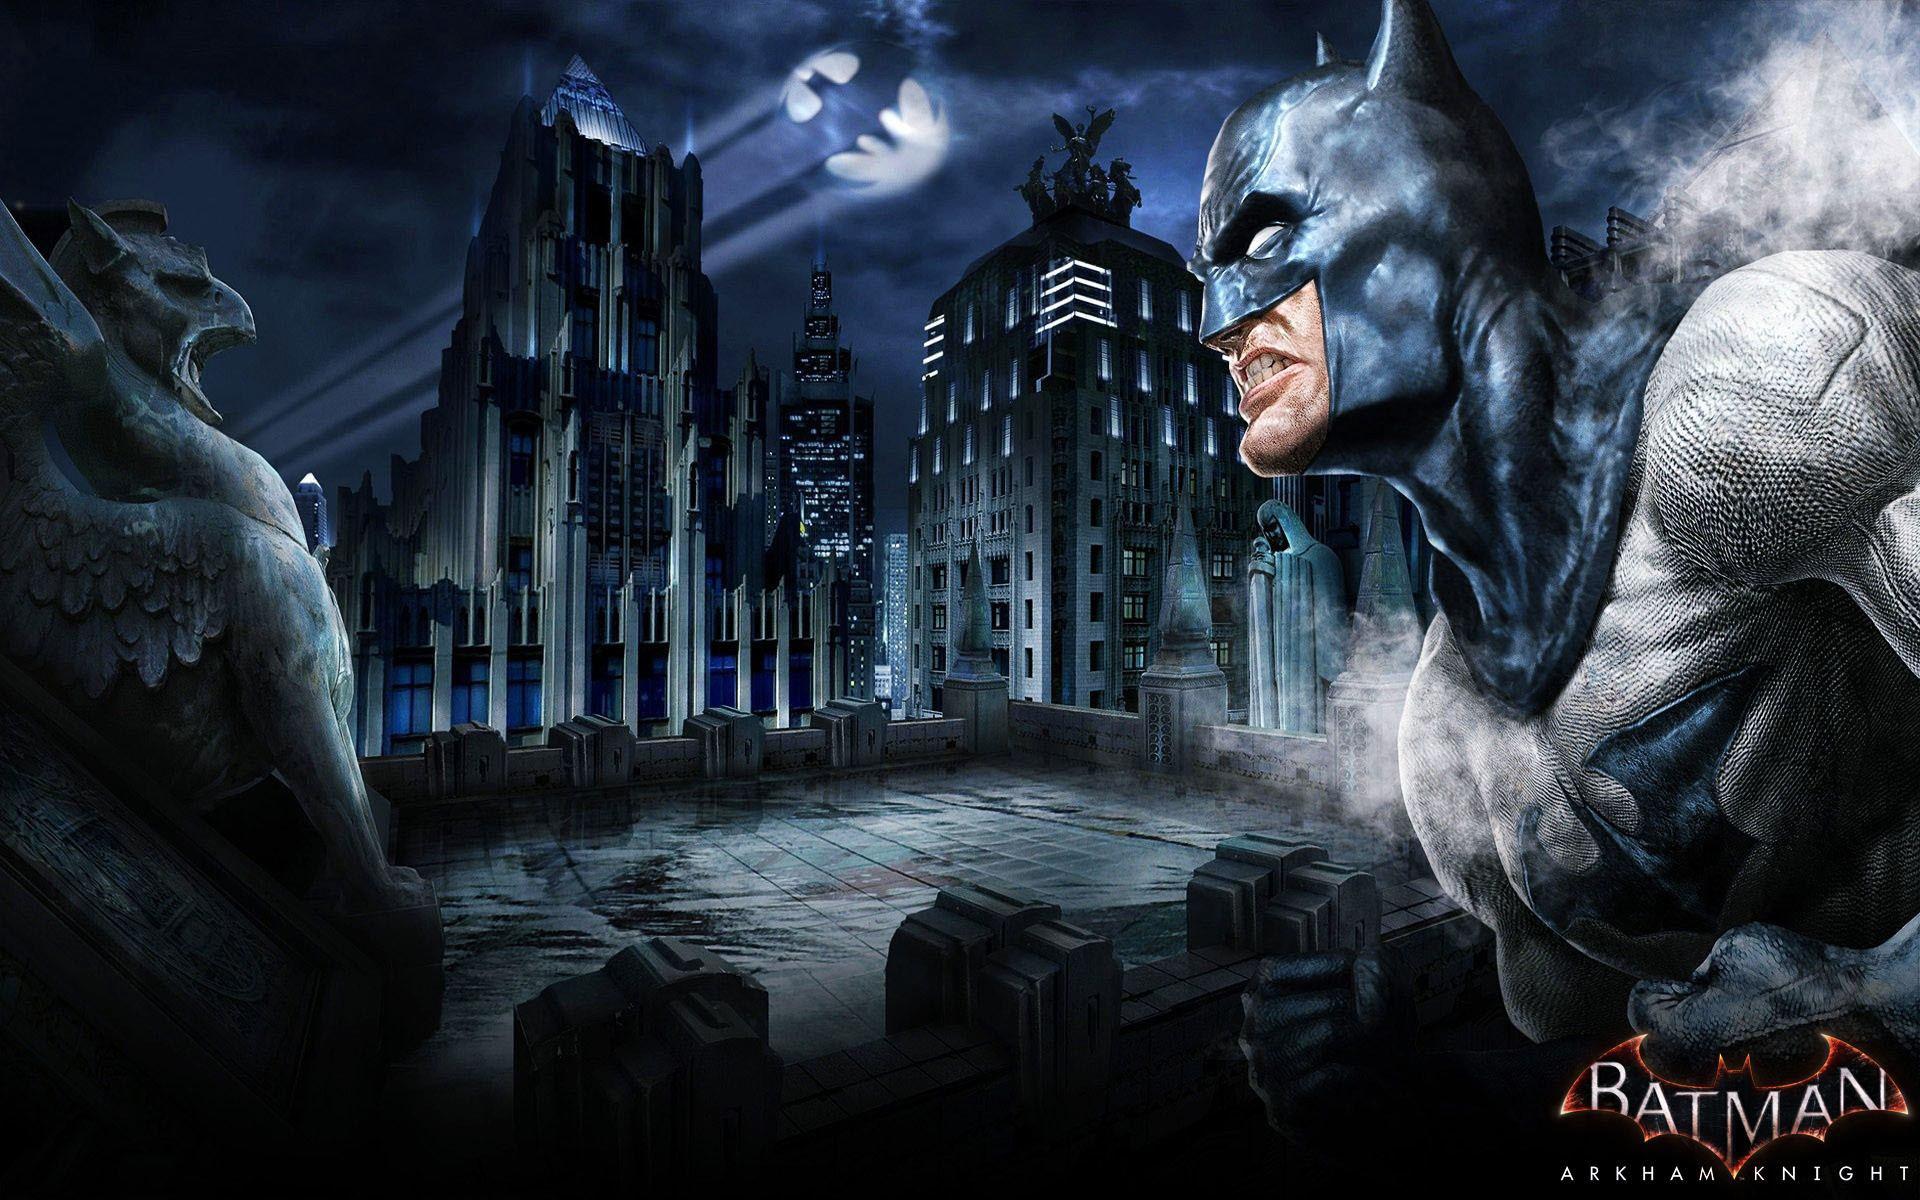 Batman Arkham Knight – The Bat-Signal wallpaper